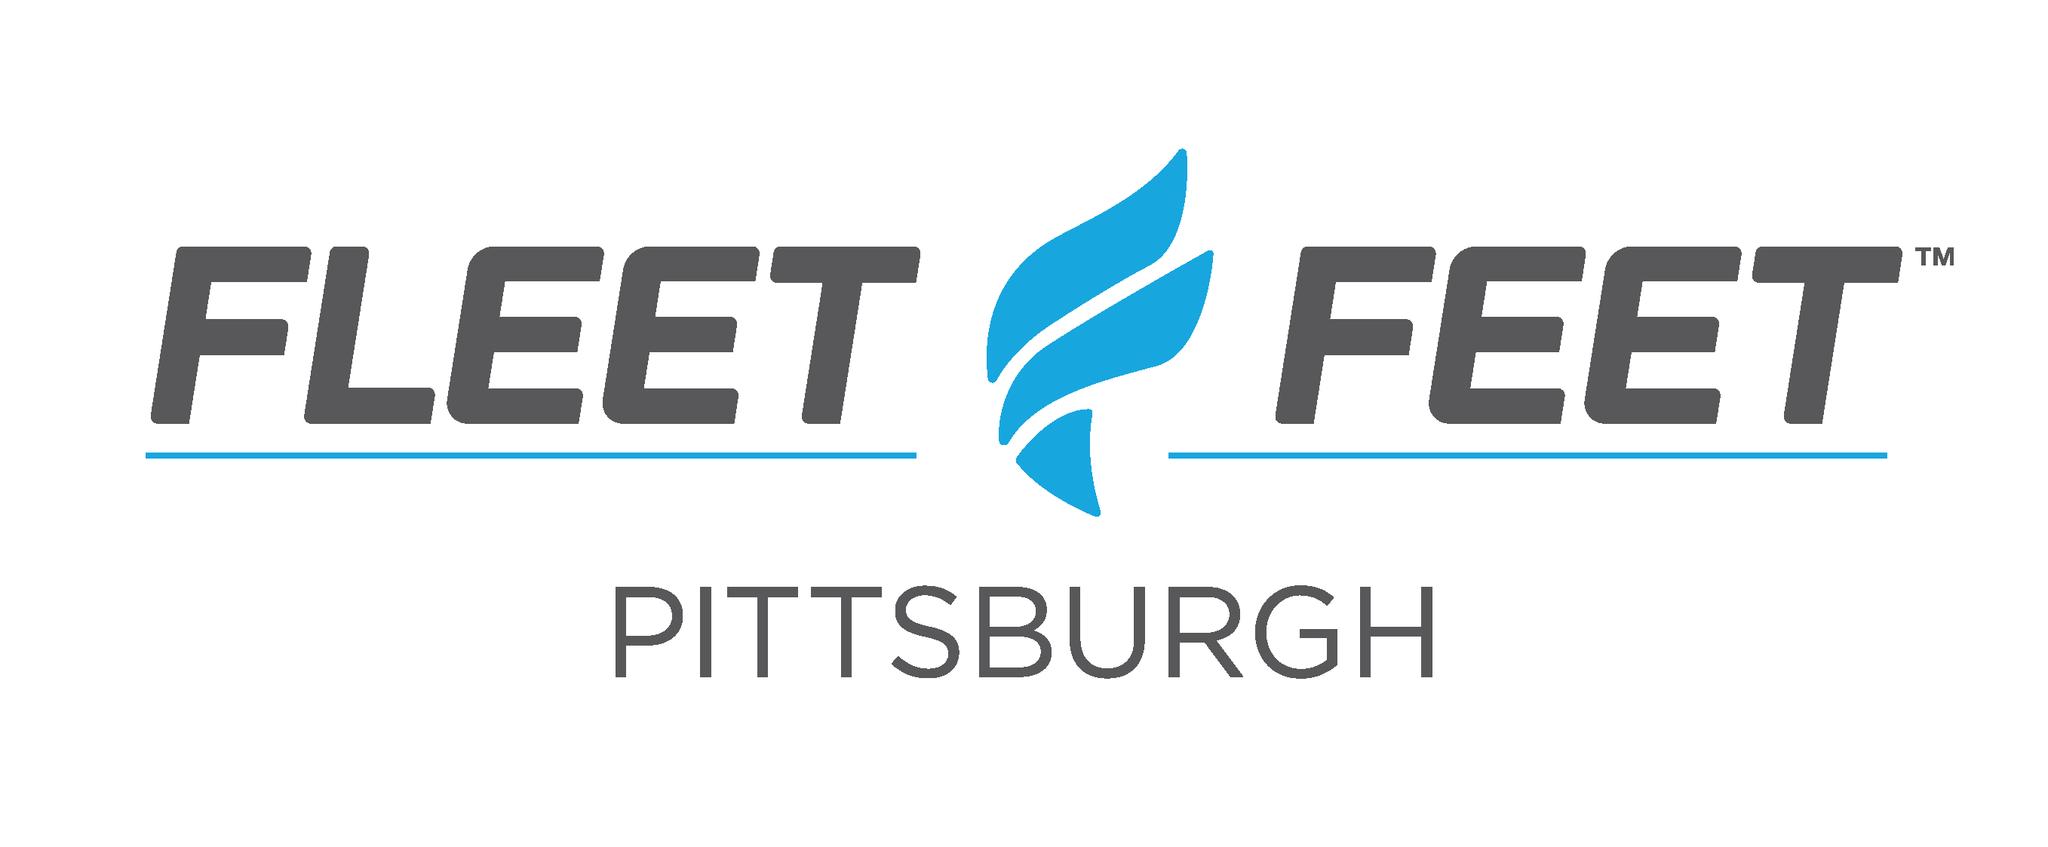 Fleet Feet Pittsburgh Logo